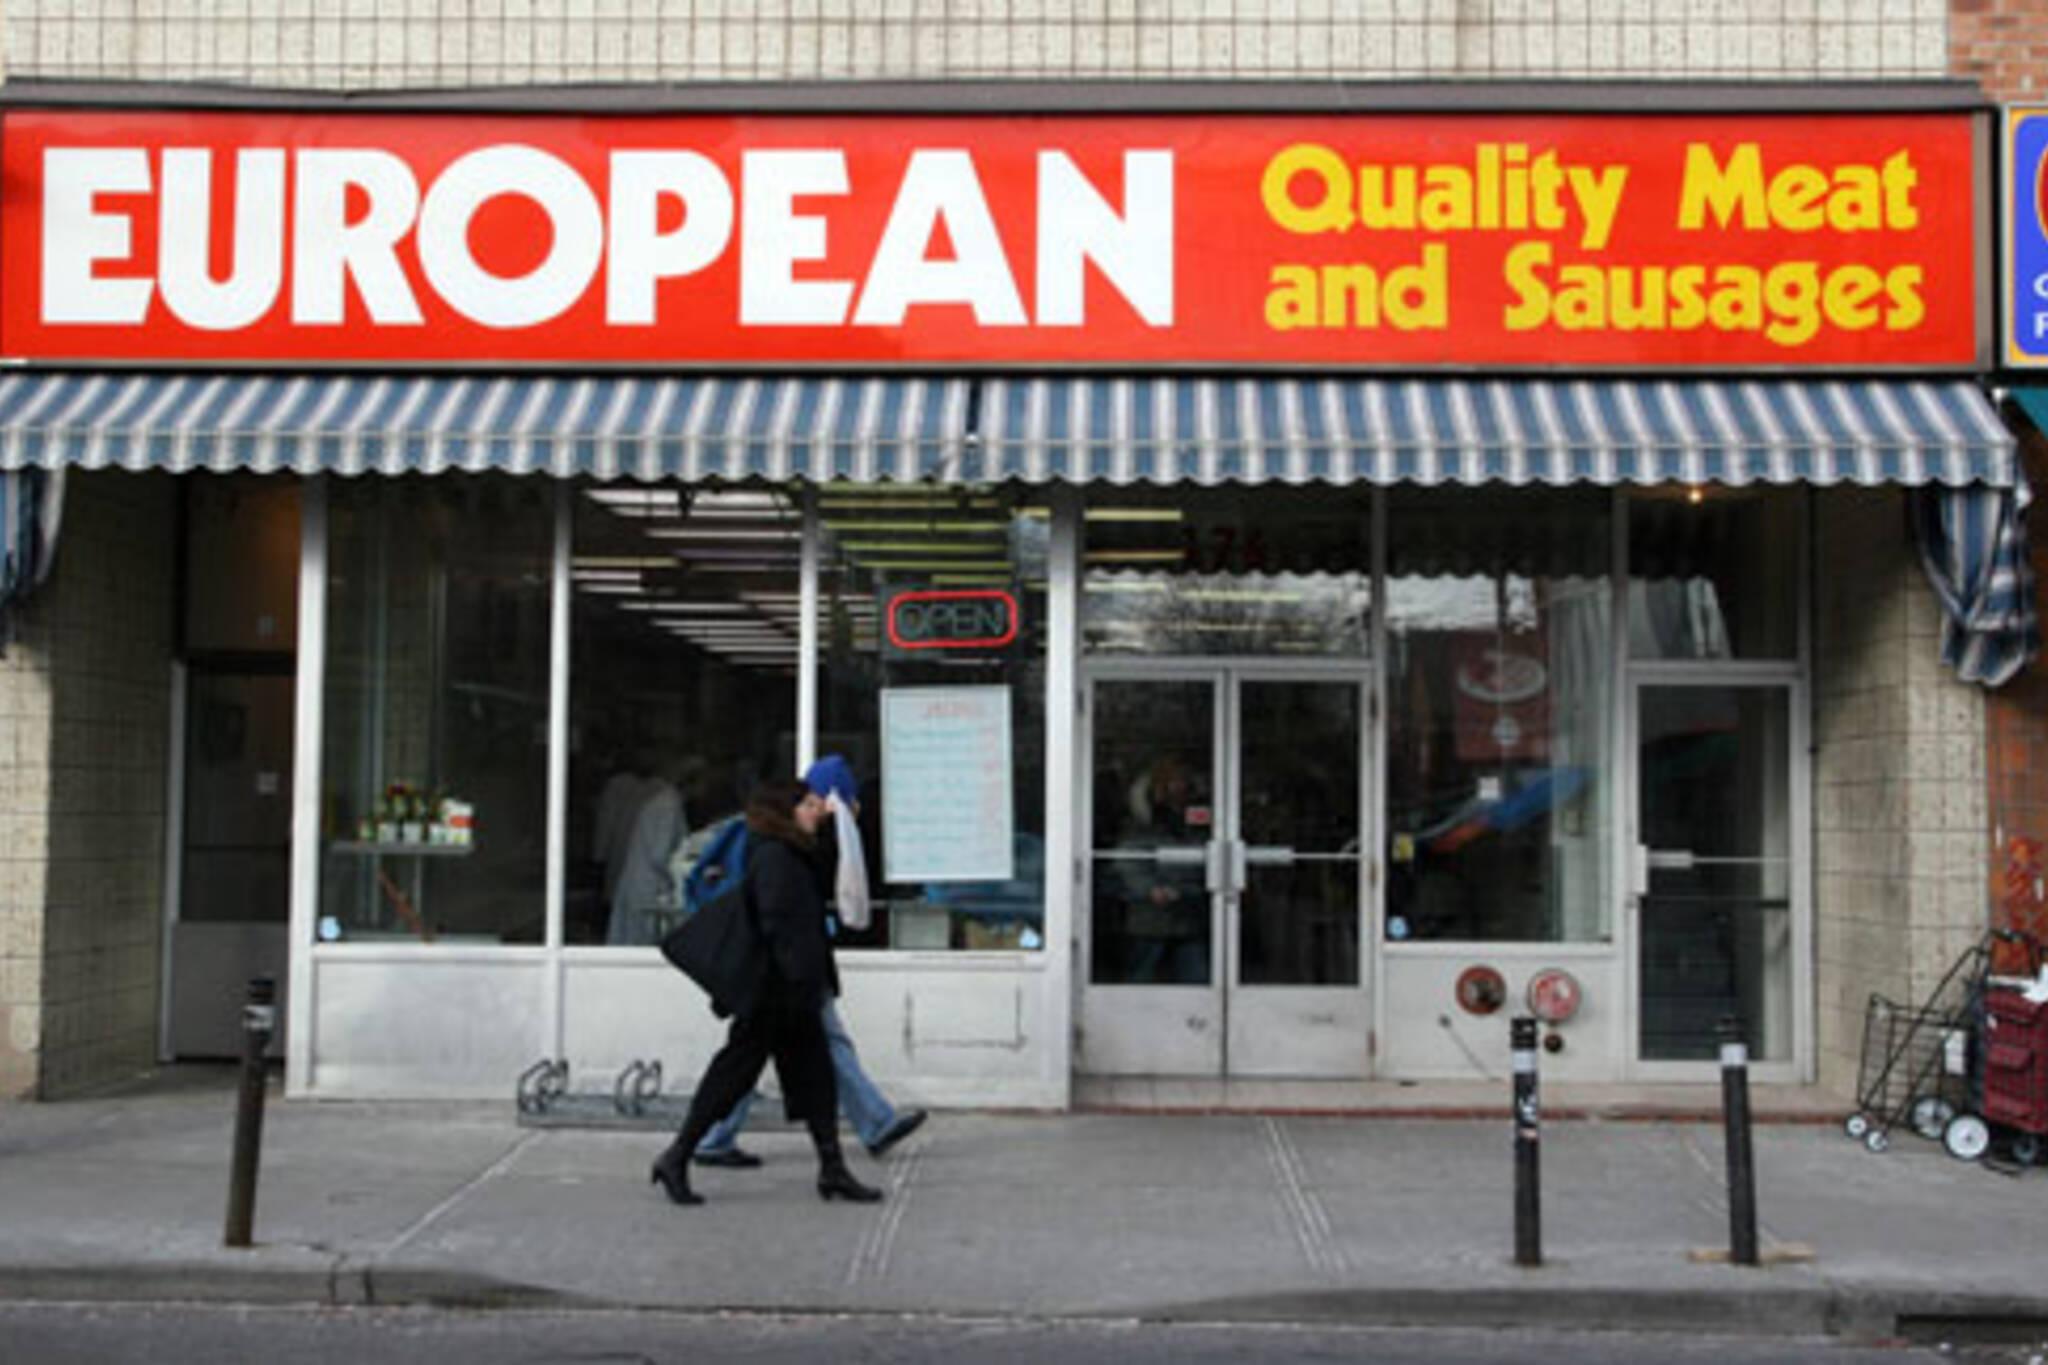 European Quality Meats & Sausages